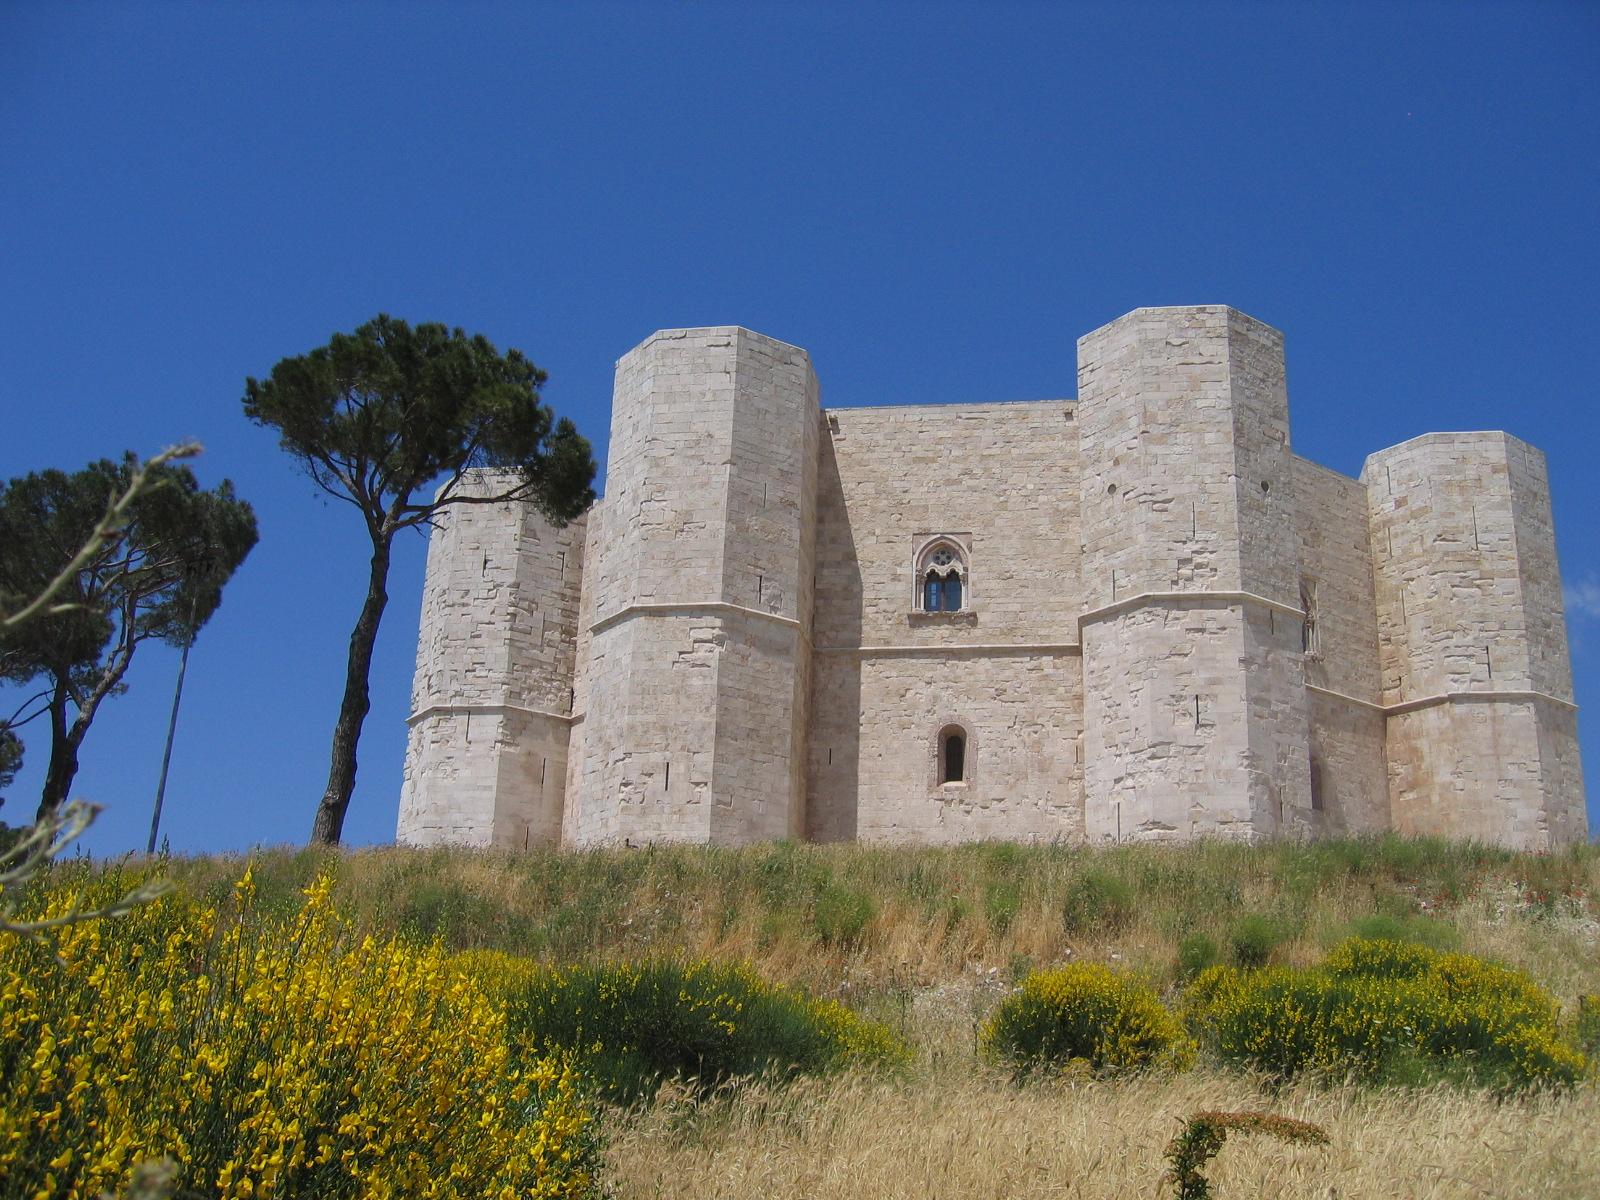 castel del monte - photo #39